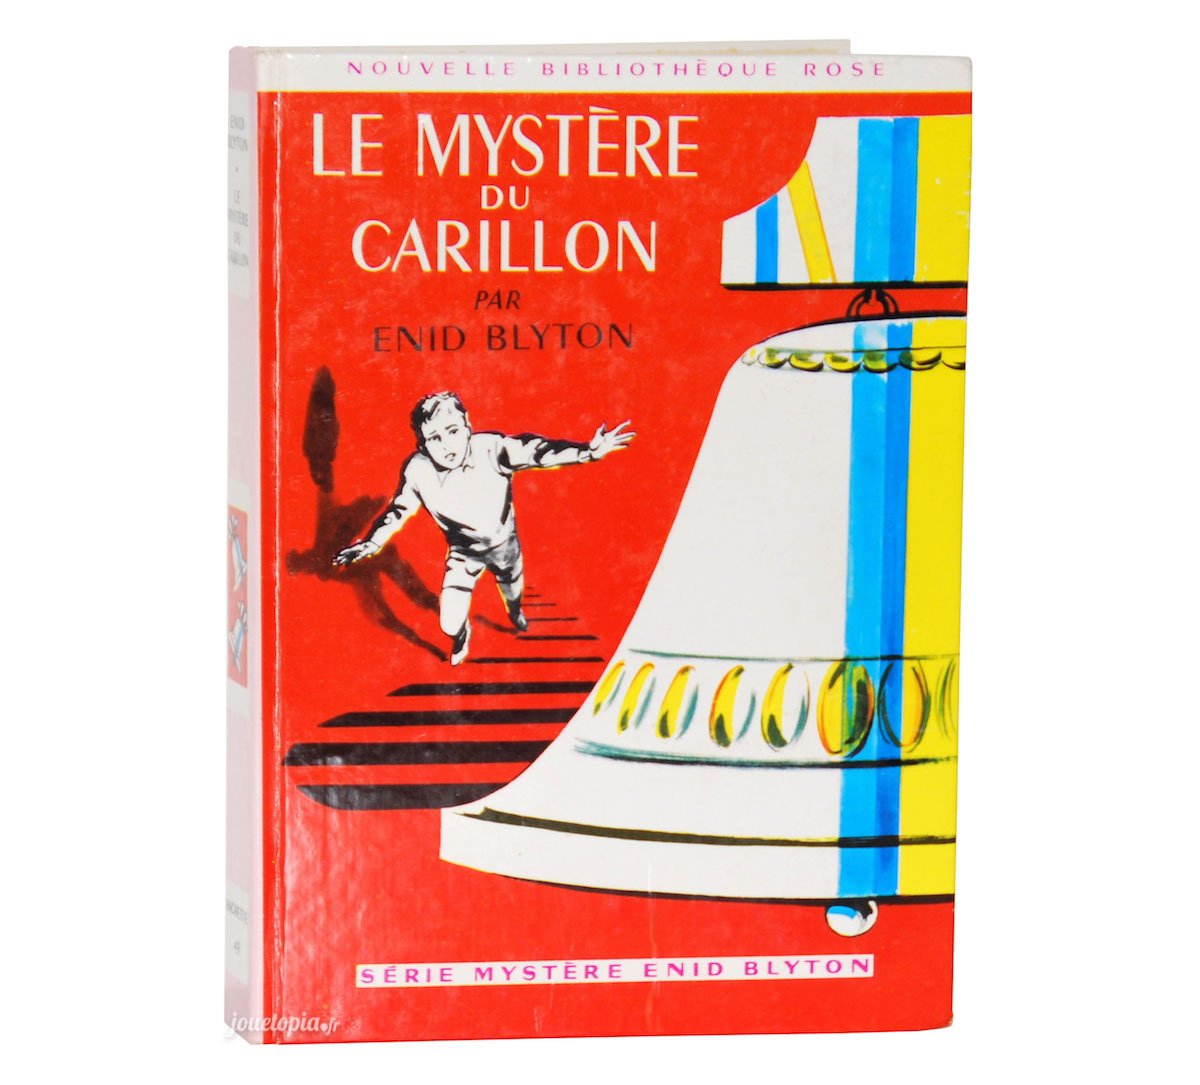 Livre Le Mystere Du Carillon Enid Blyton Bibliotheque Rose